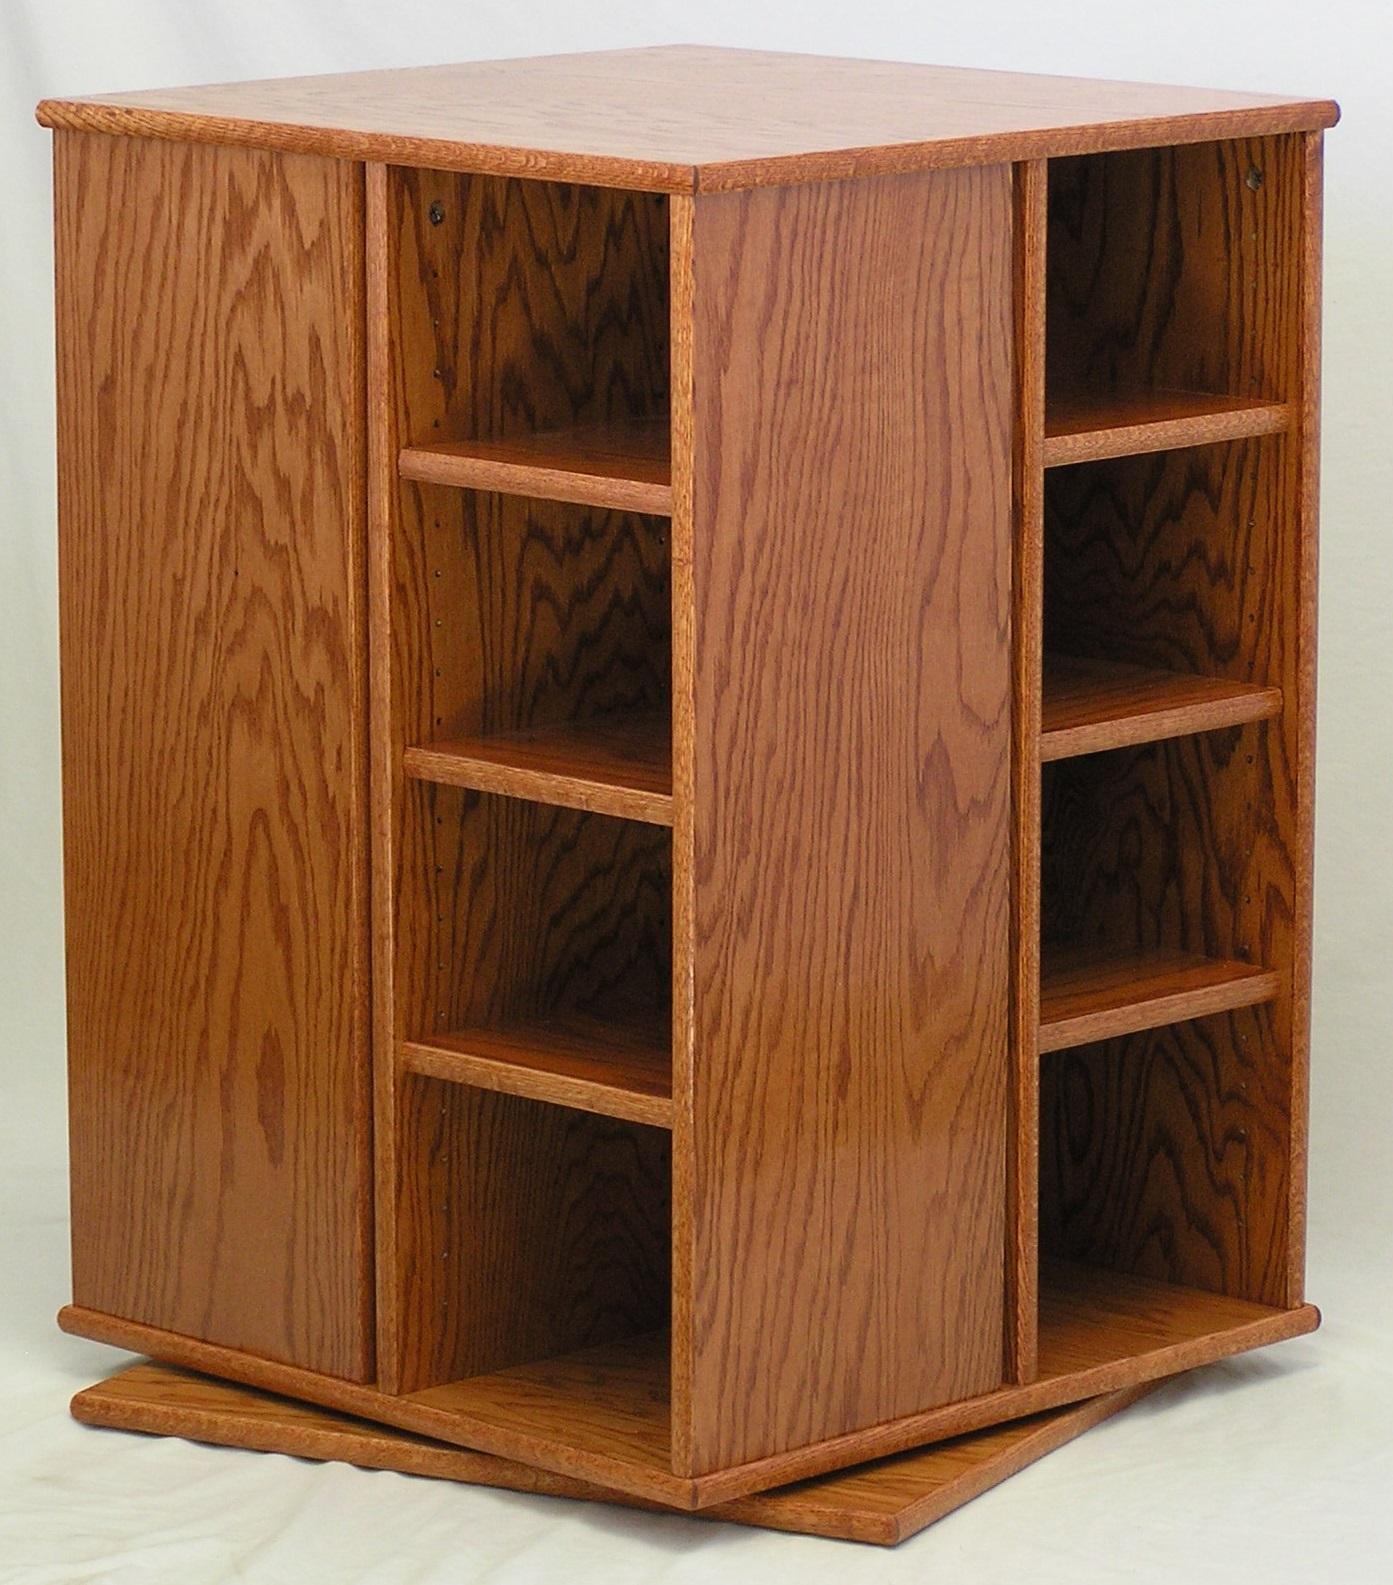 swivel bookcase custom Minwax Gunstock finish by decibeldesigns.com